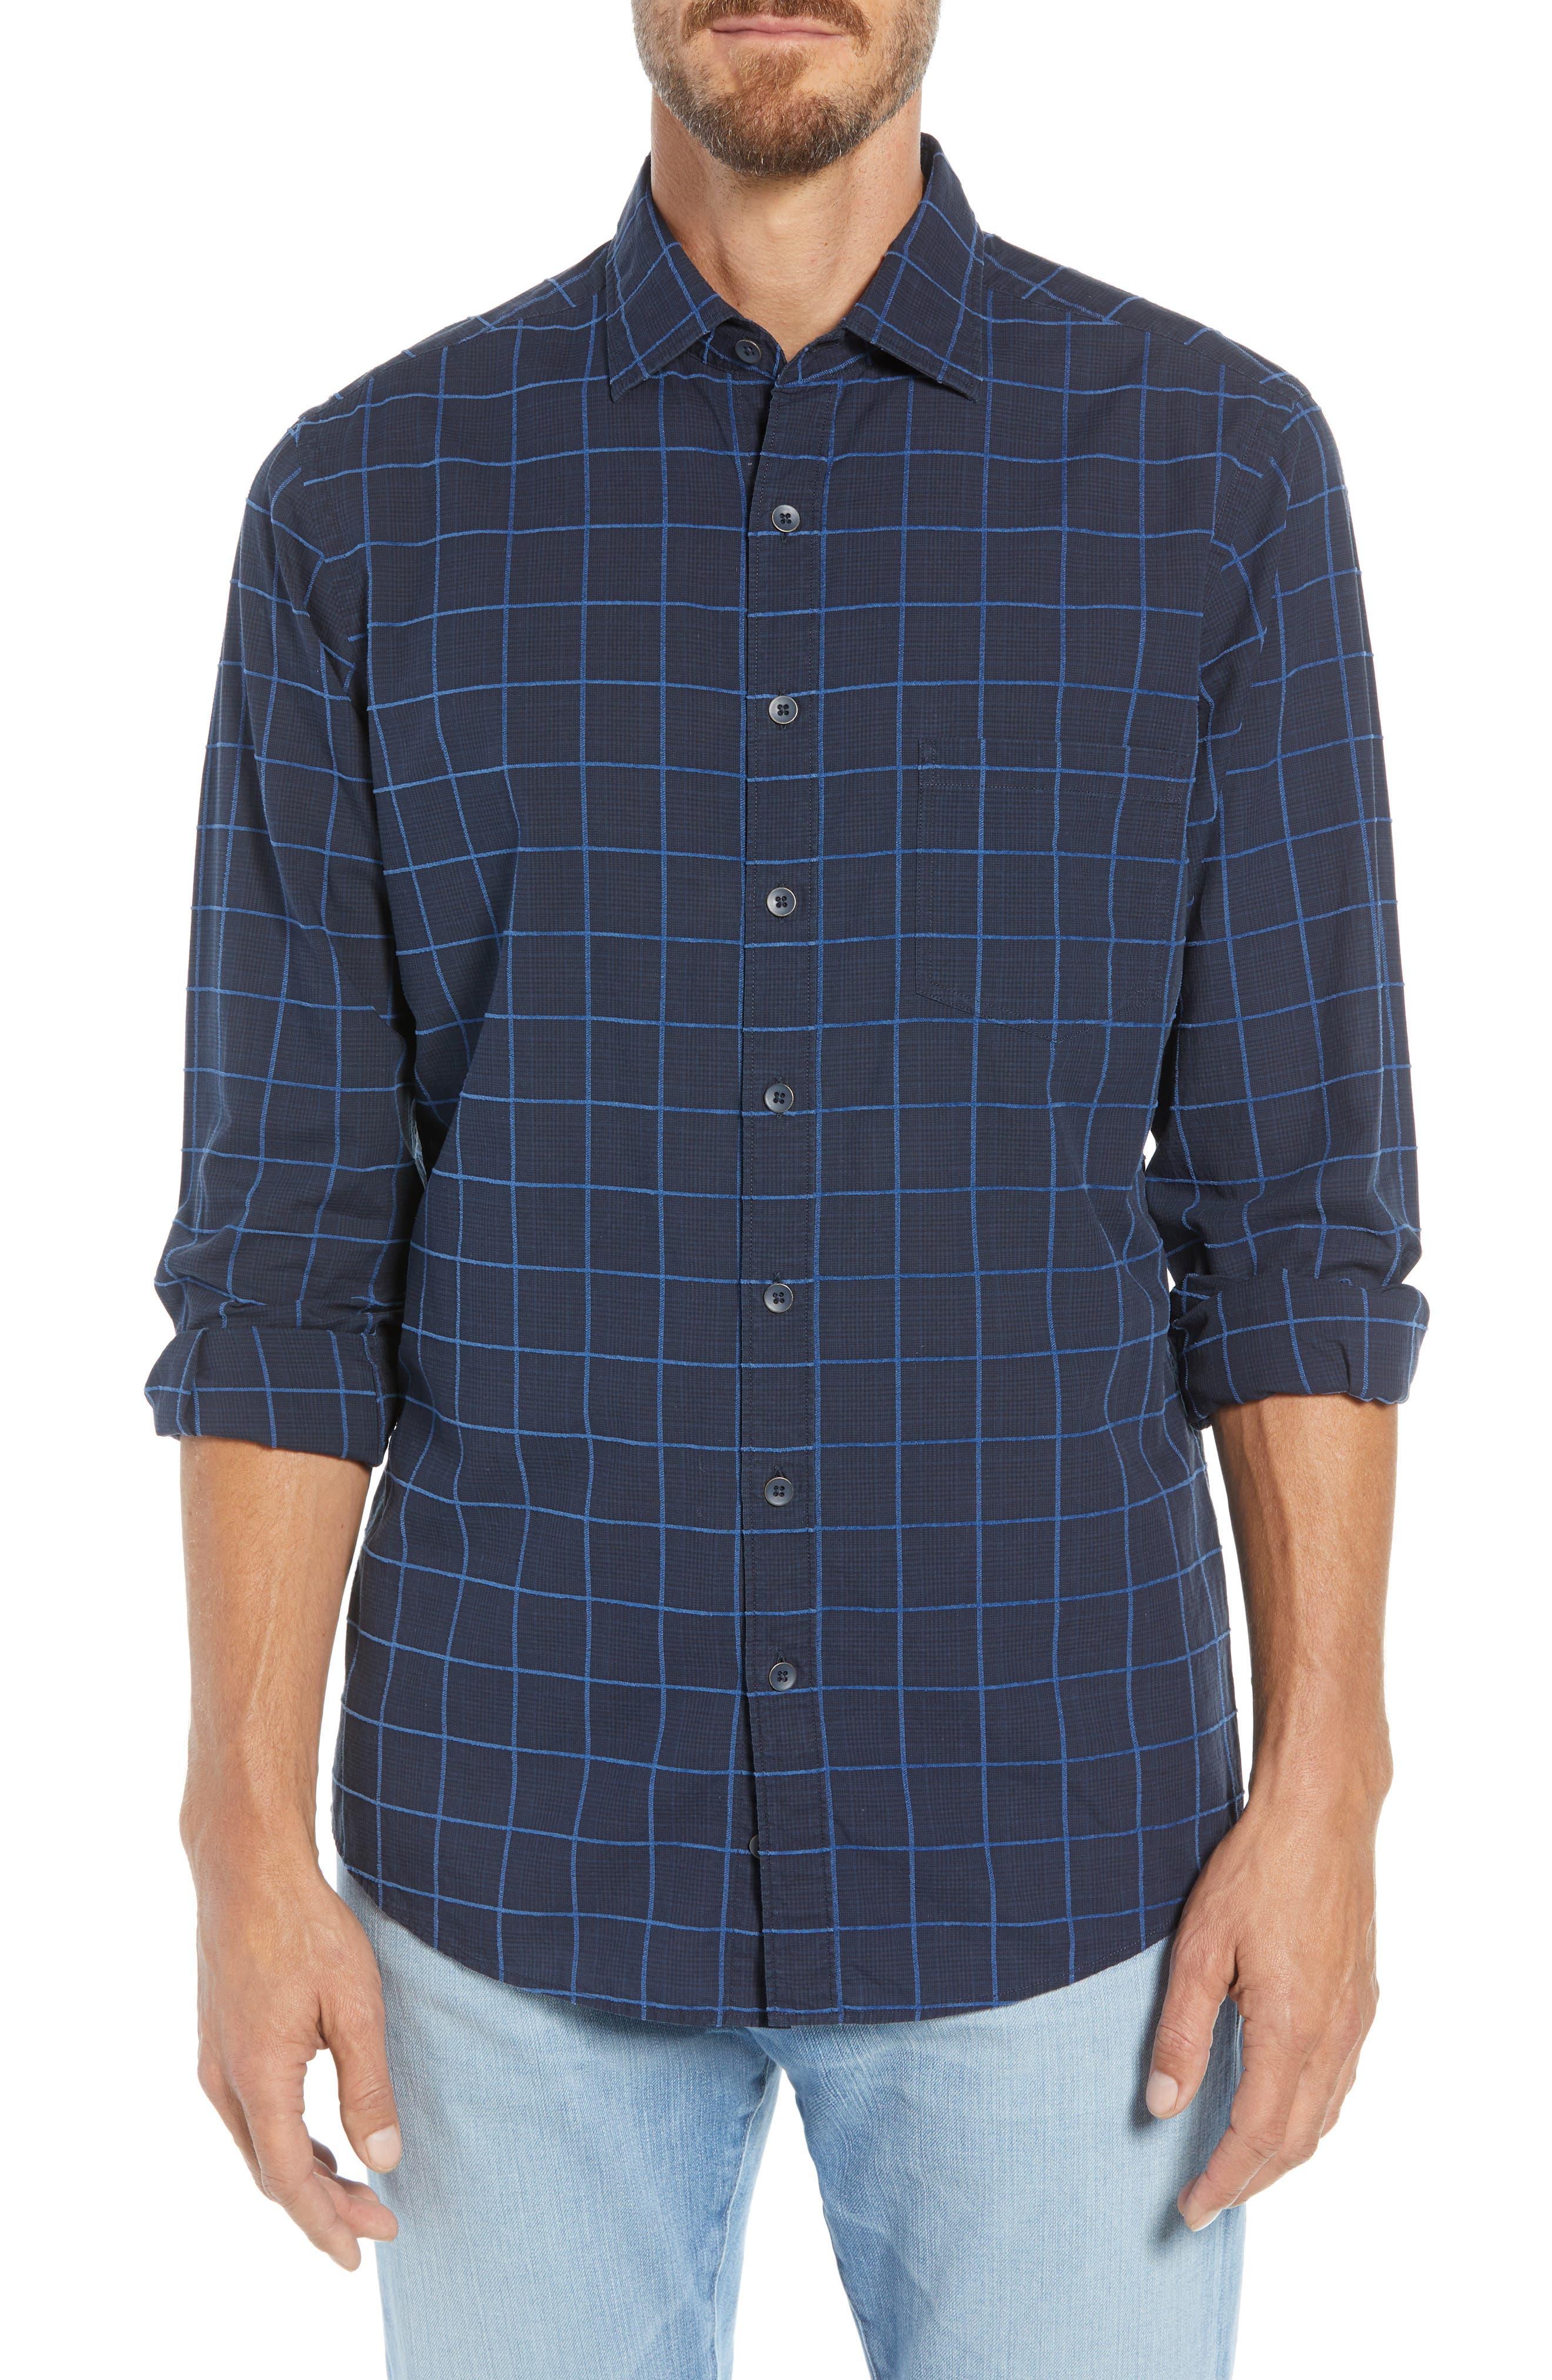 RODD & GUNN Hindley Creek Regular Fit Sport Shirt, Main, color, NAVY